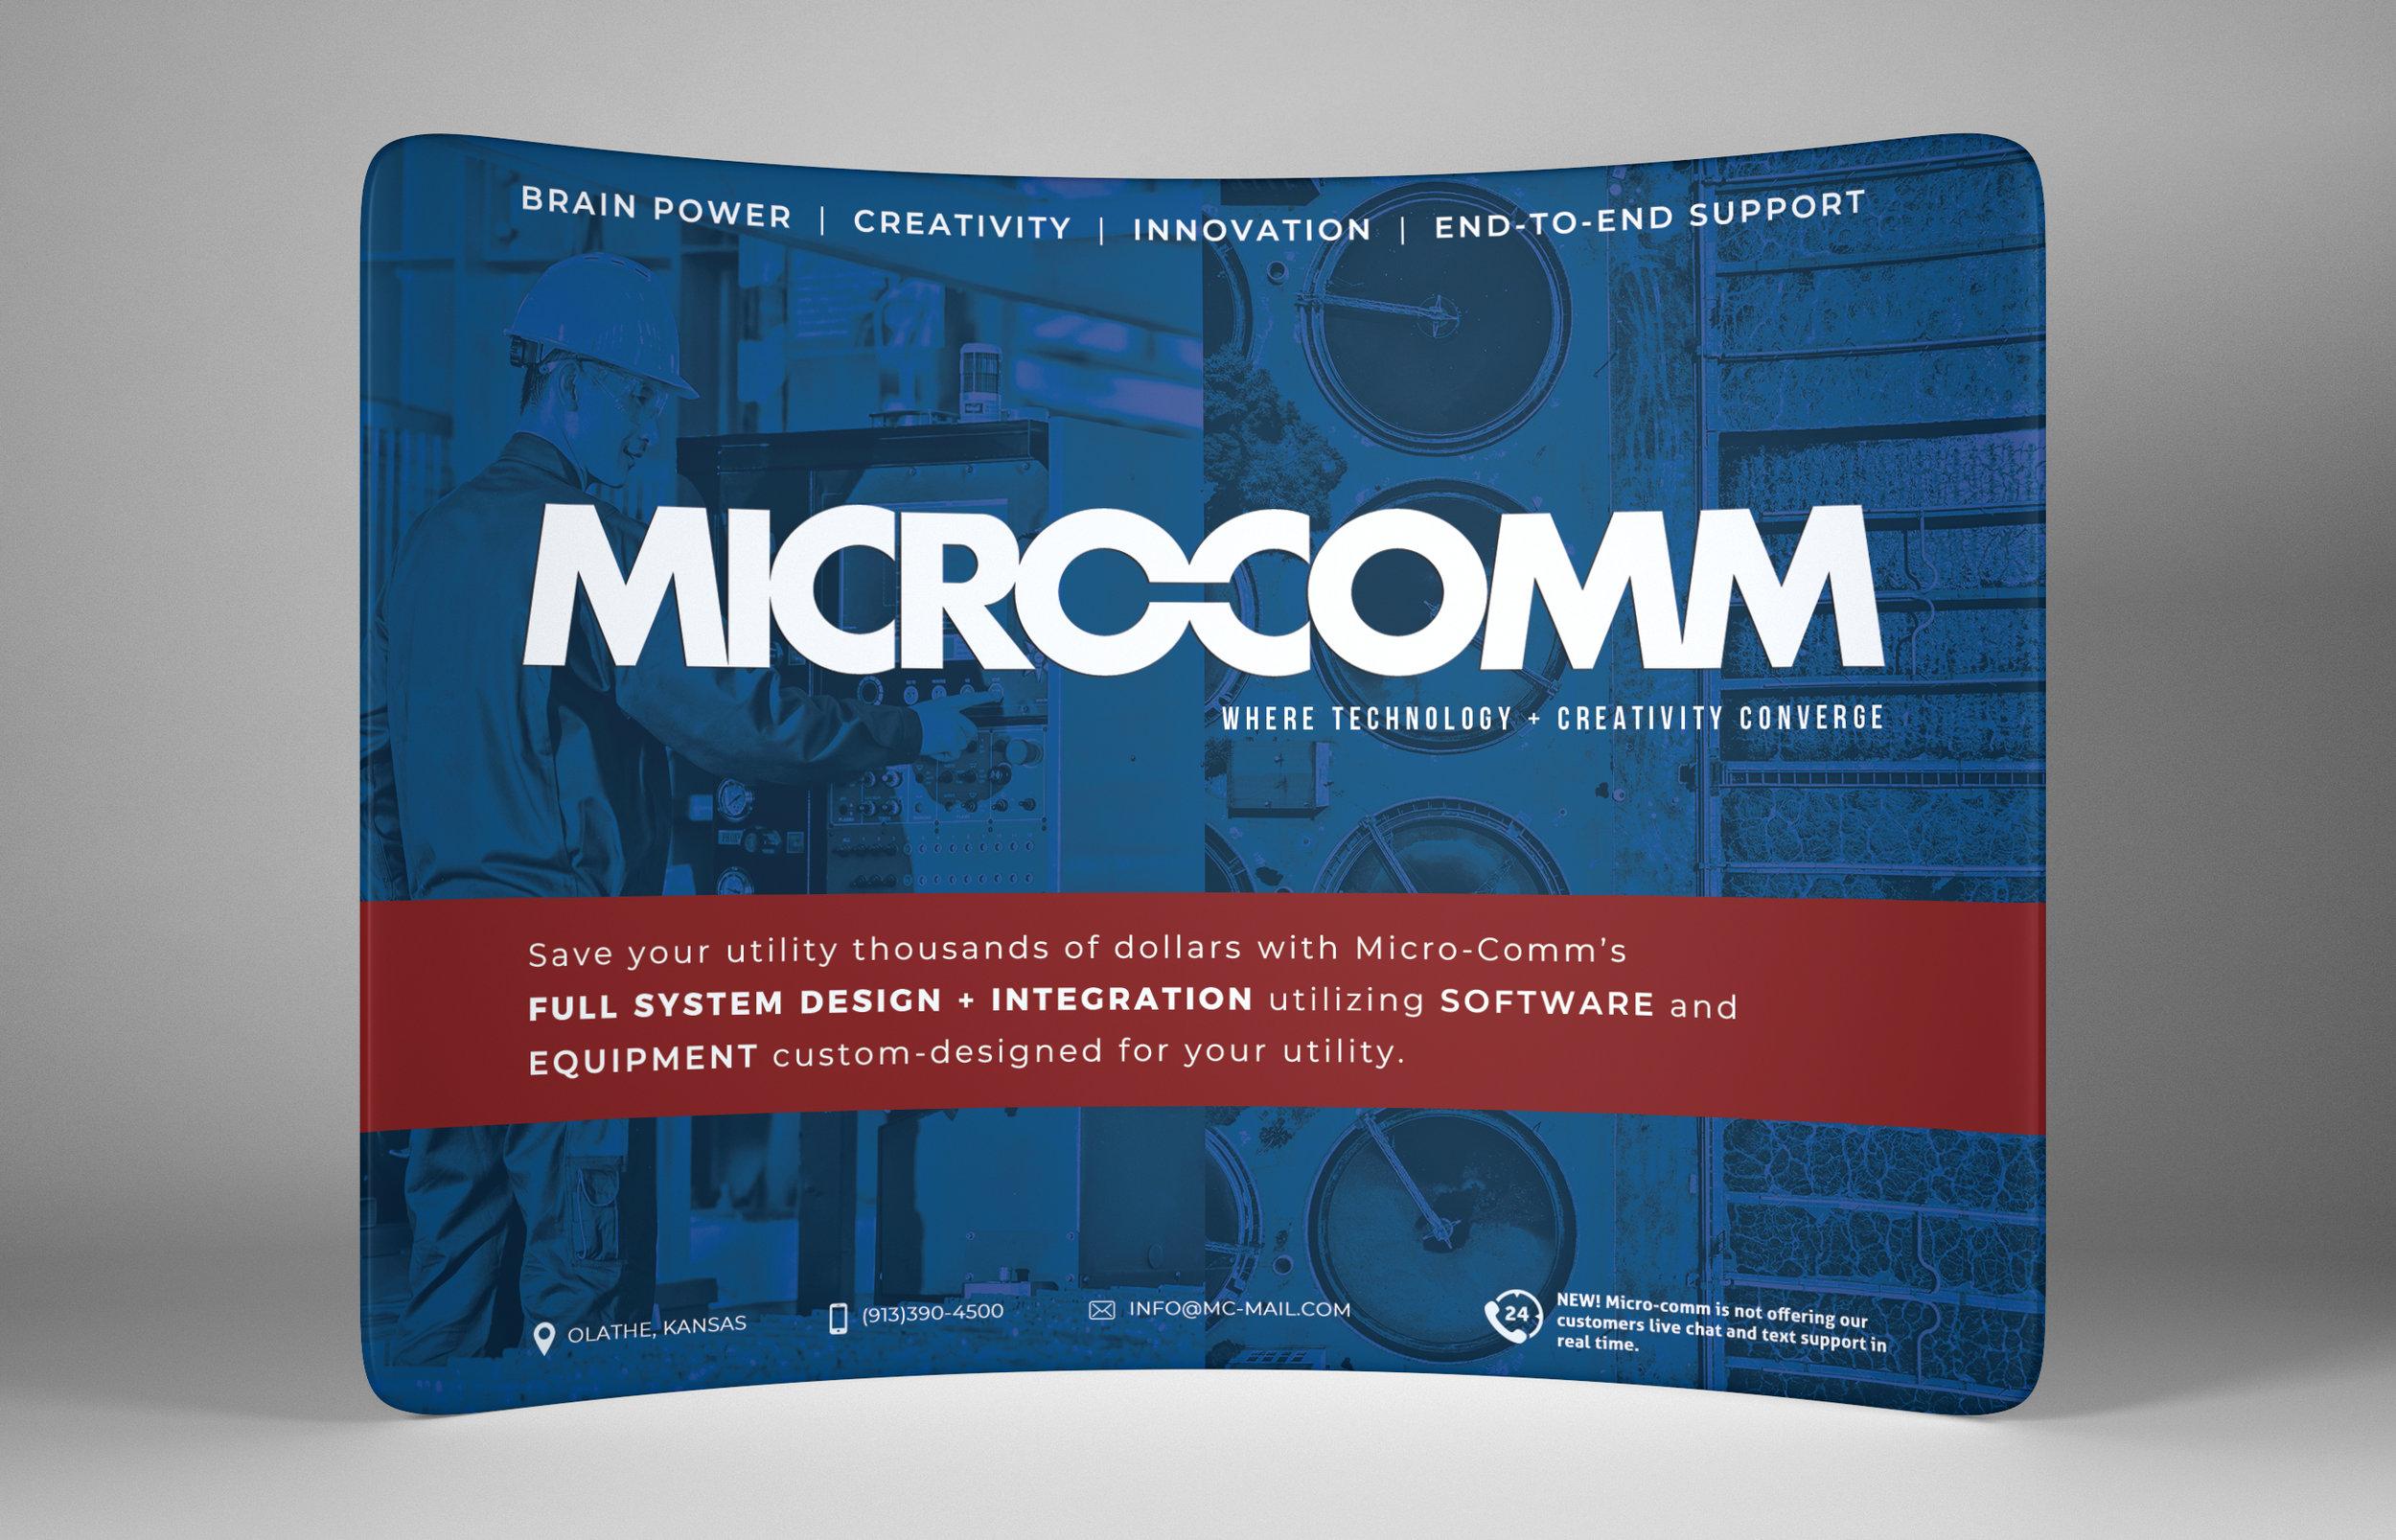 V.4 MICROCOMM banner mockup 5.jpg